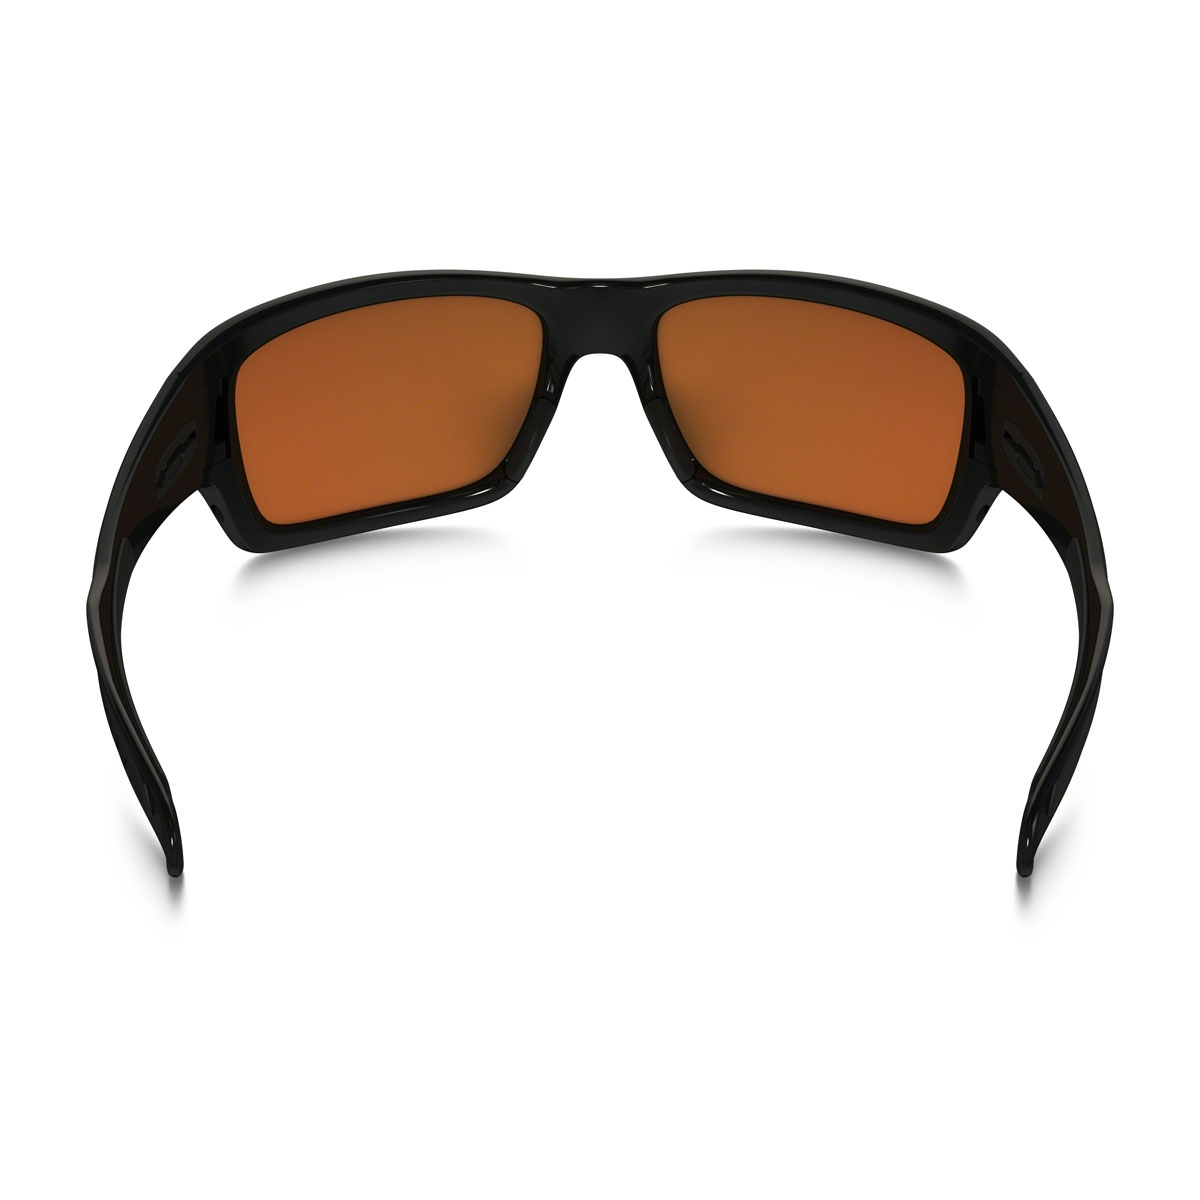 b0b400e837 ... Image of Oakley Turbine Sunglasses - Polished Black   Prizm Shallow  Water Polarized ...